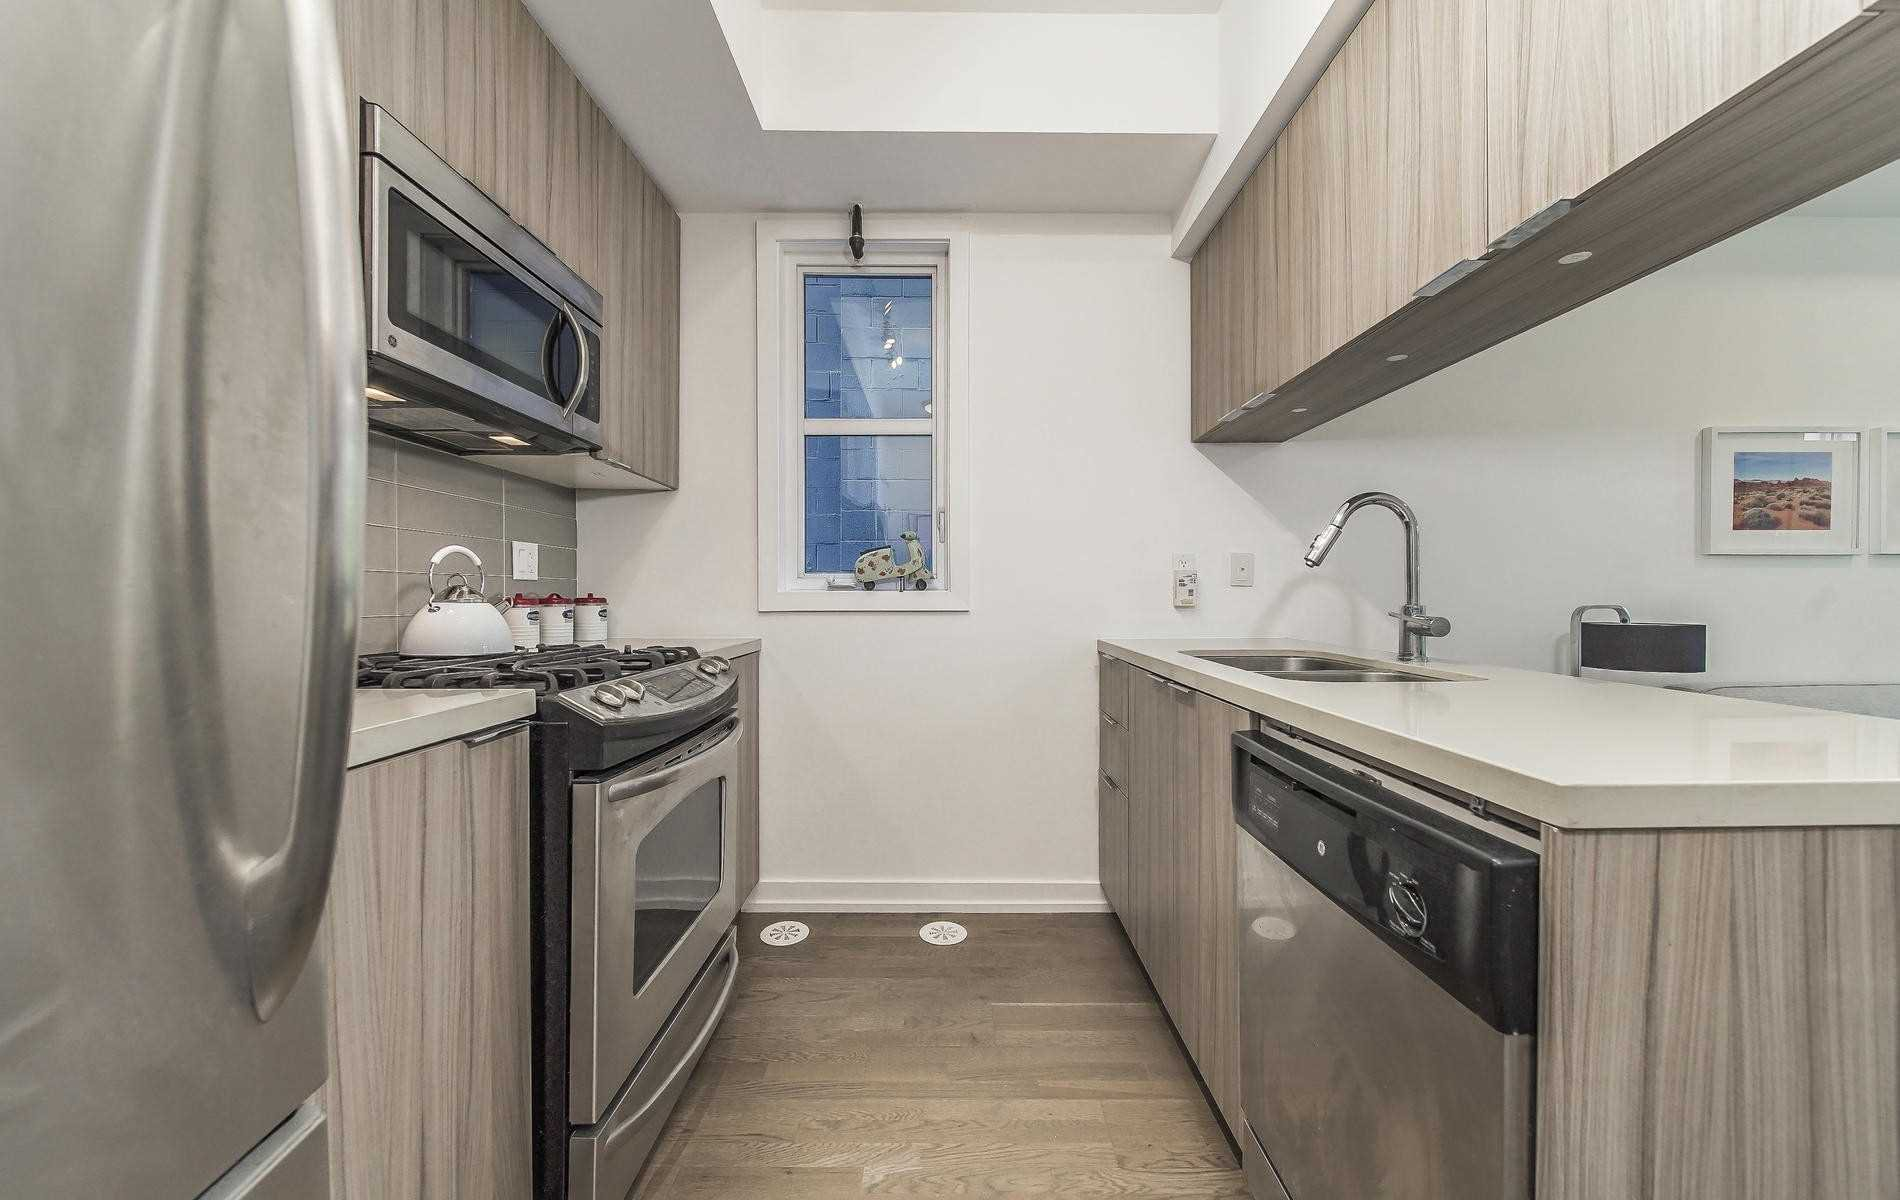 Photo 5: Photos: Th 11 150 Broadview Avenue in Toronto: South Riverdale Condo for sale (Toronto E01)  : MLS®# E4519038